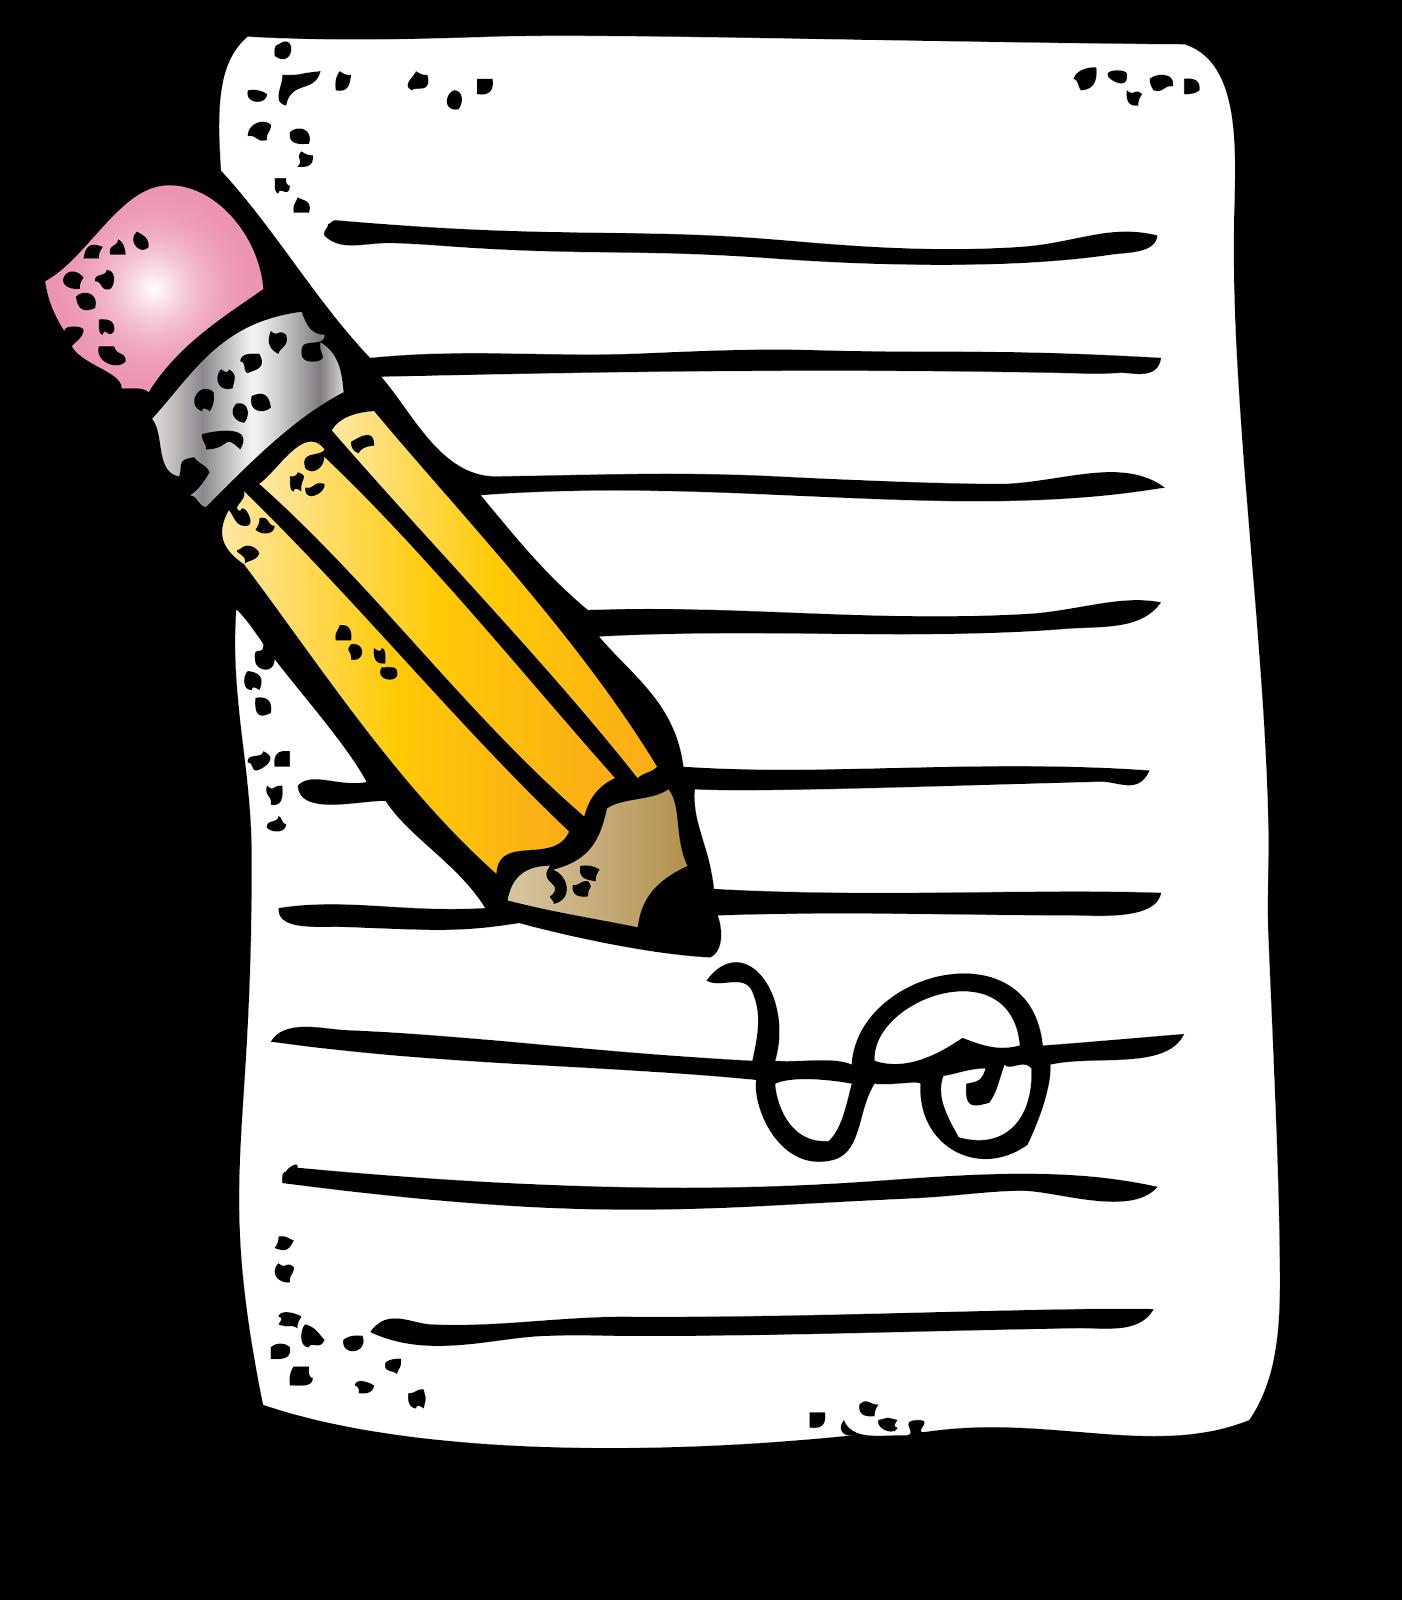 Clipart writing teaching writing. Teacher toolbox november i